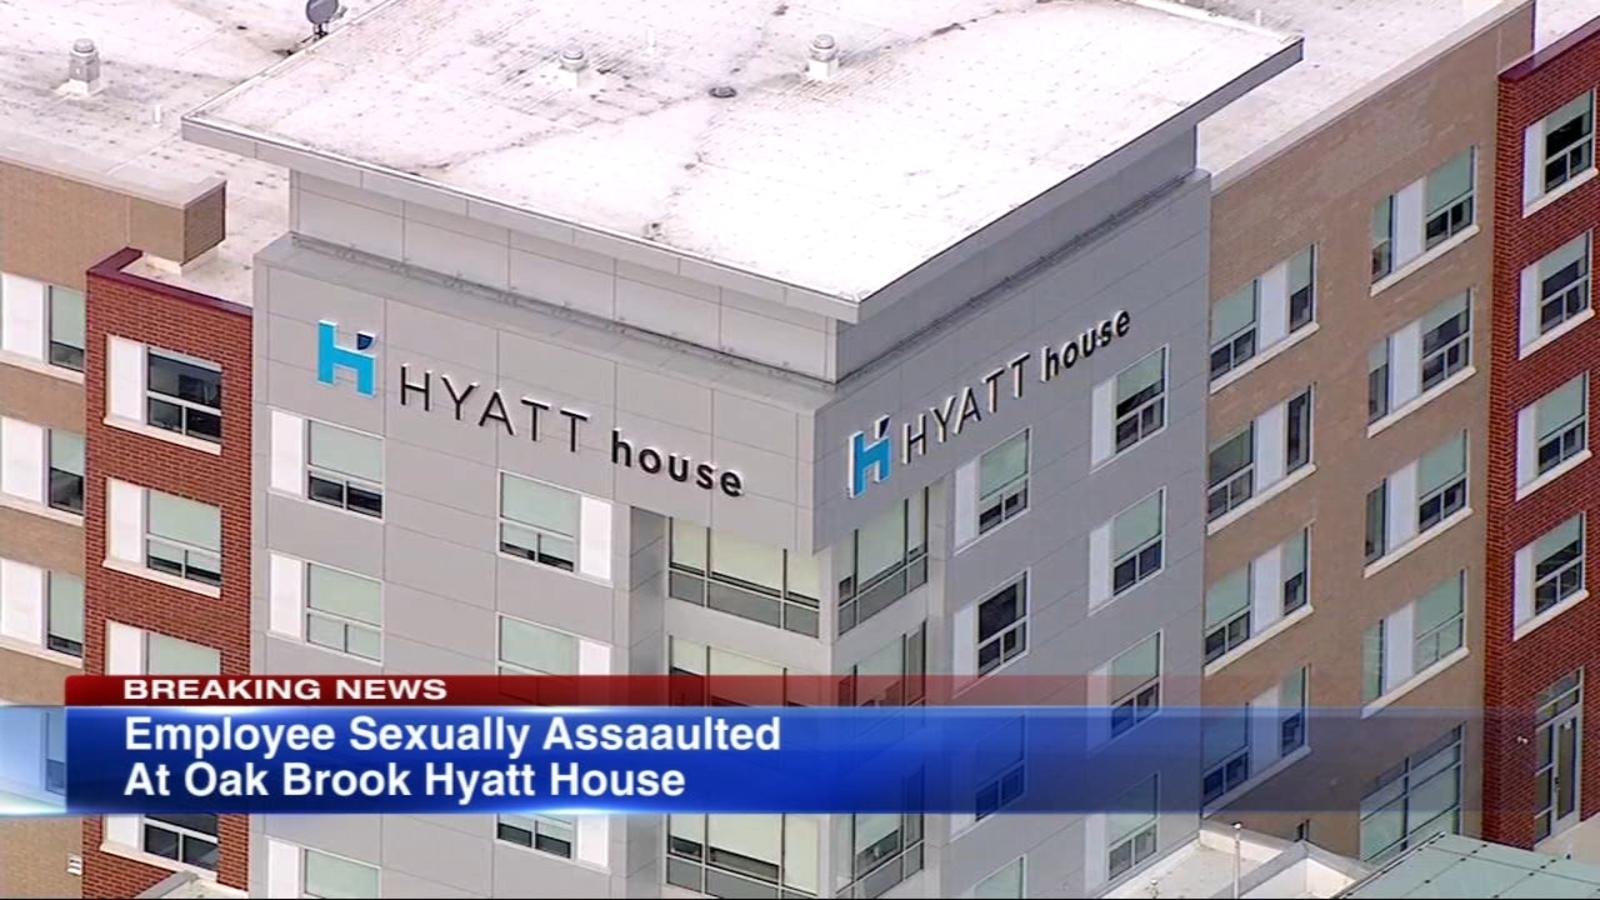 Chicago man arrested for sex assault of Oak Brook Hyatt House employee: police